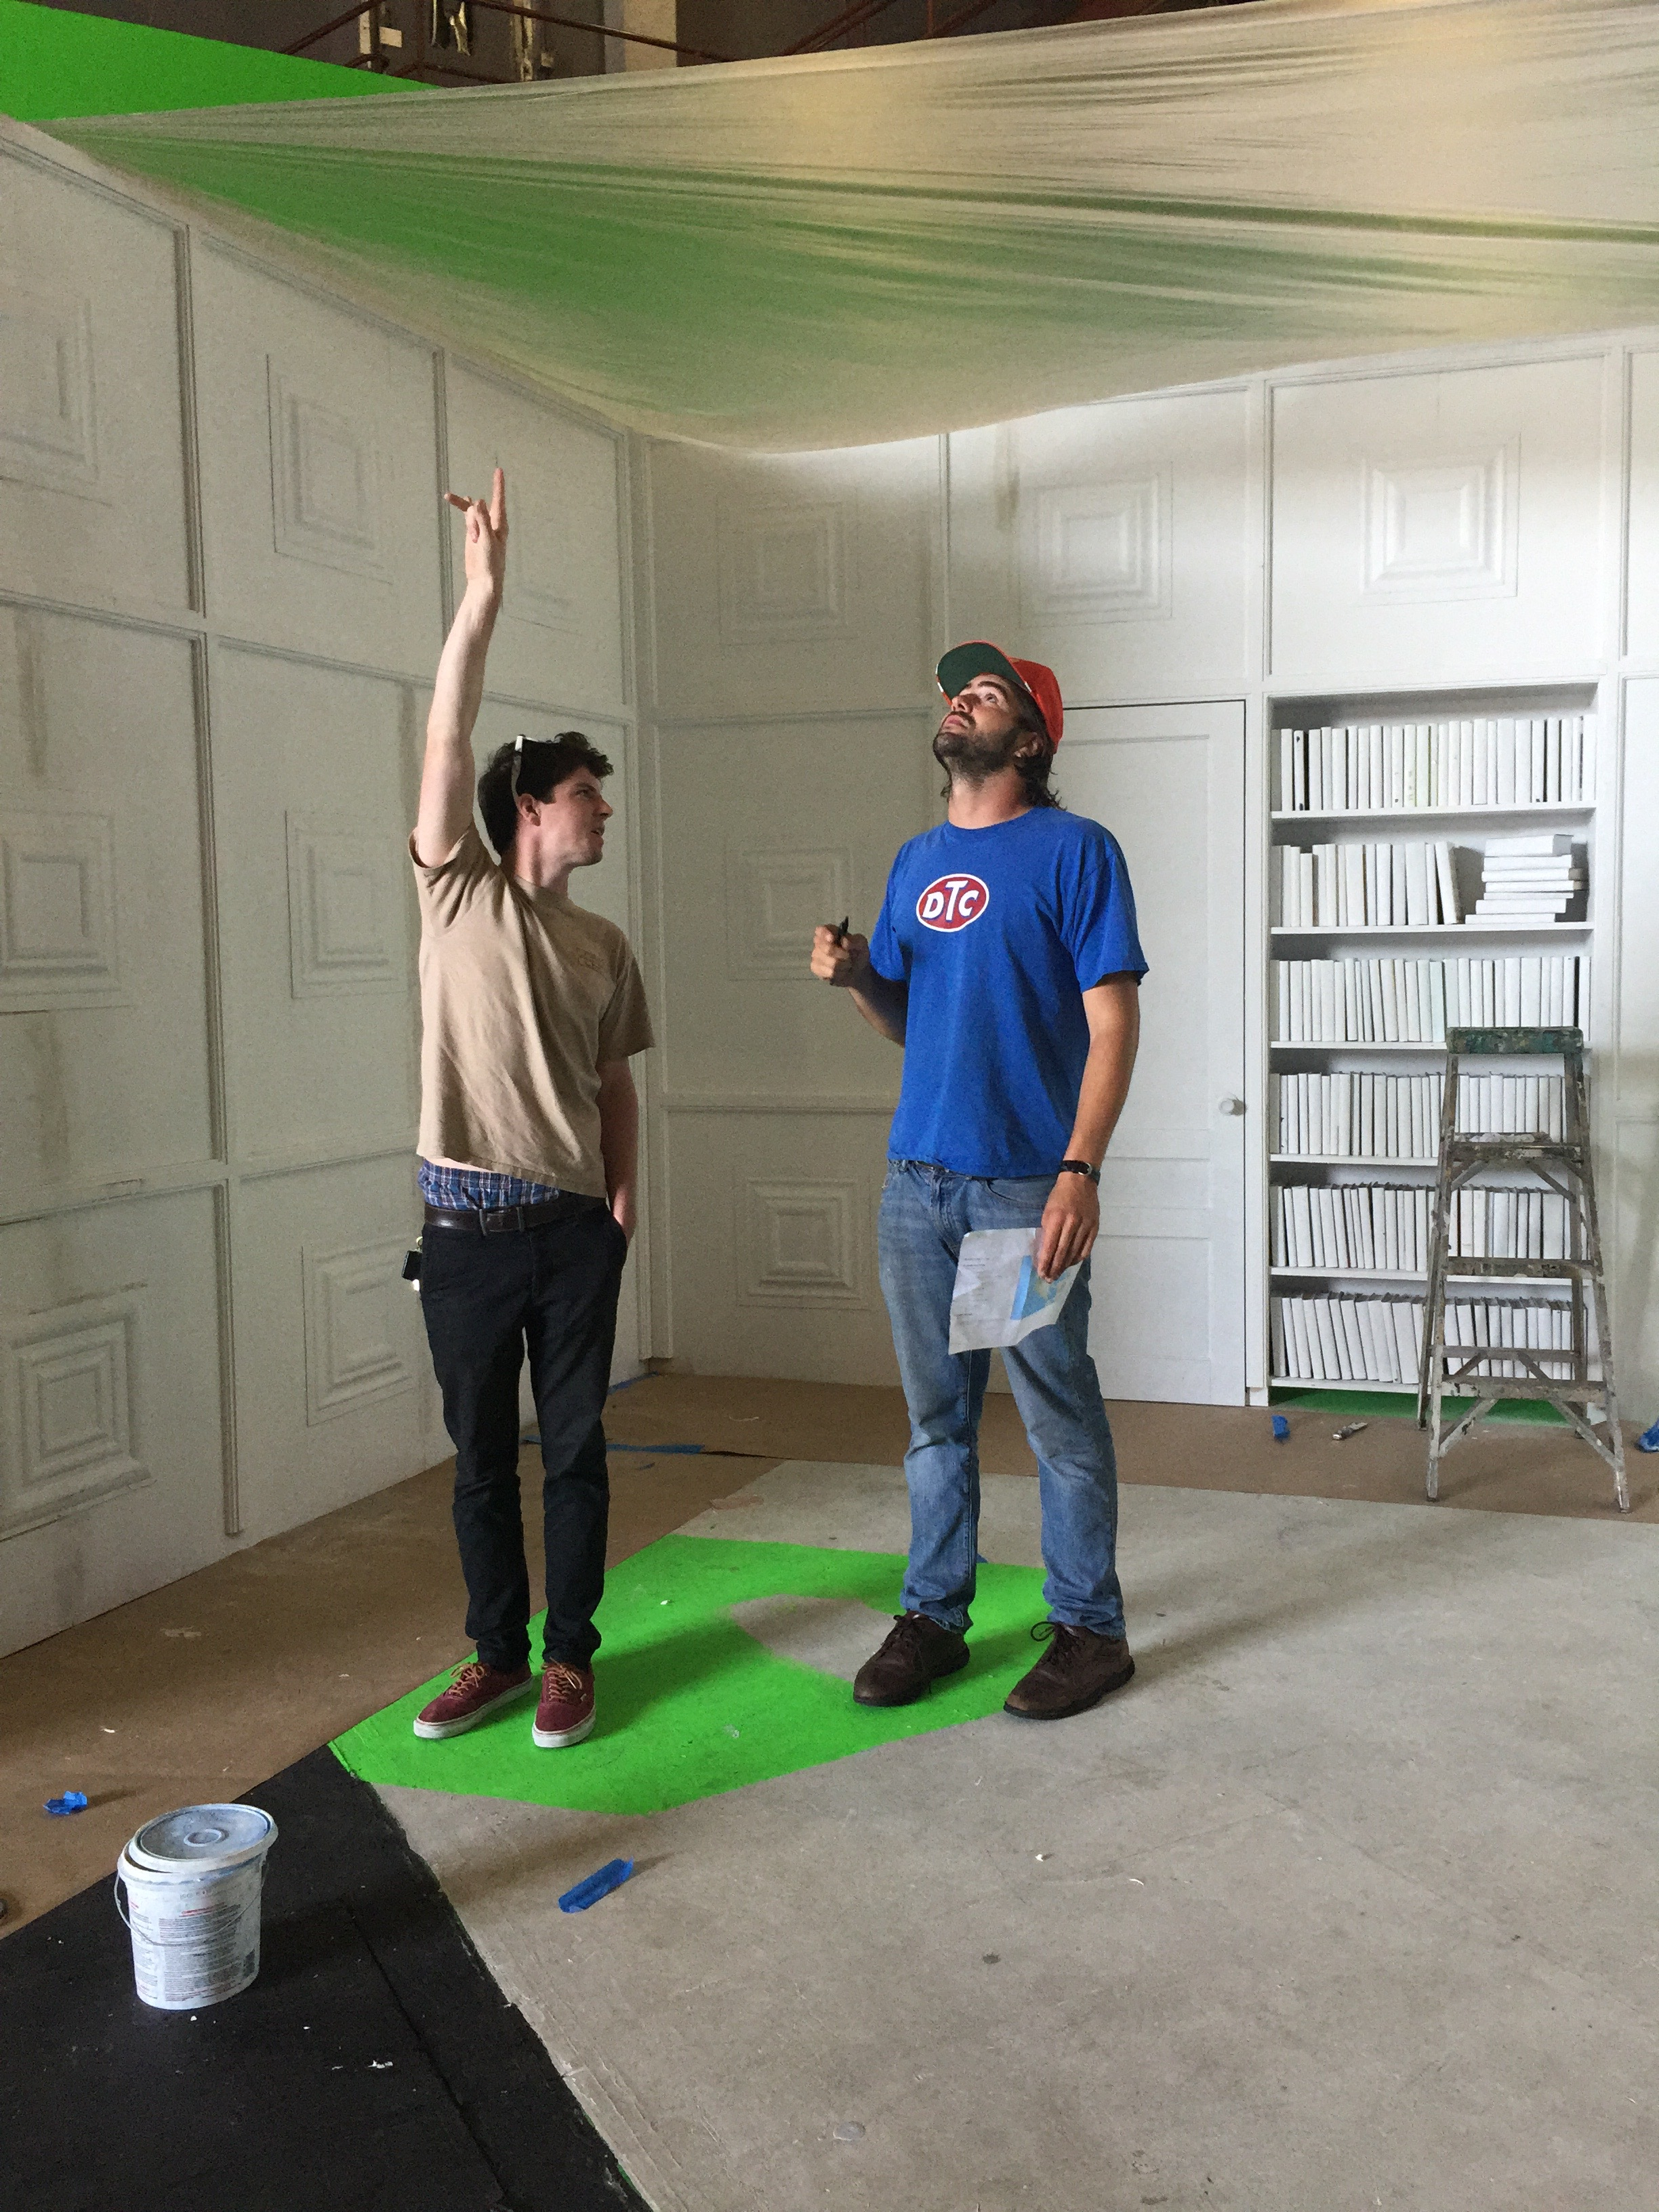 Steve & Steve counting for the grid